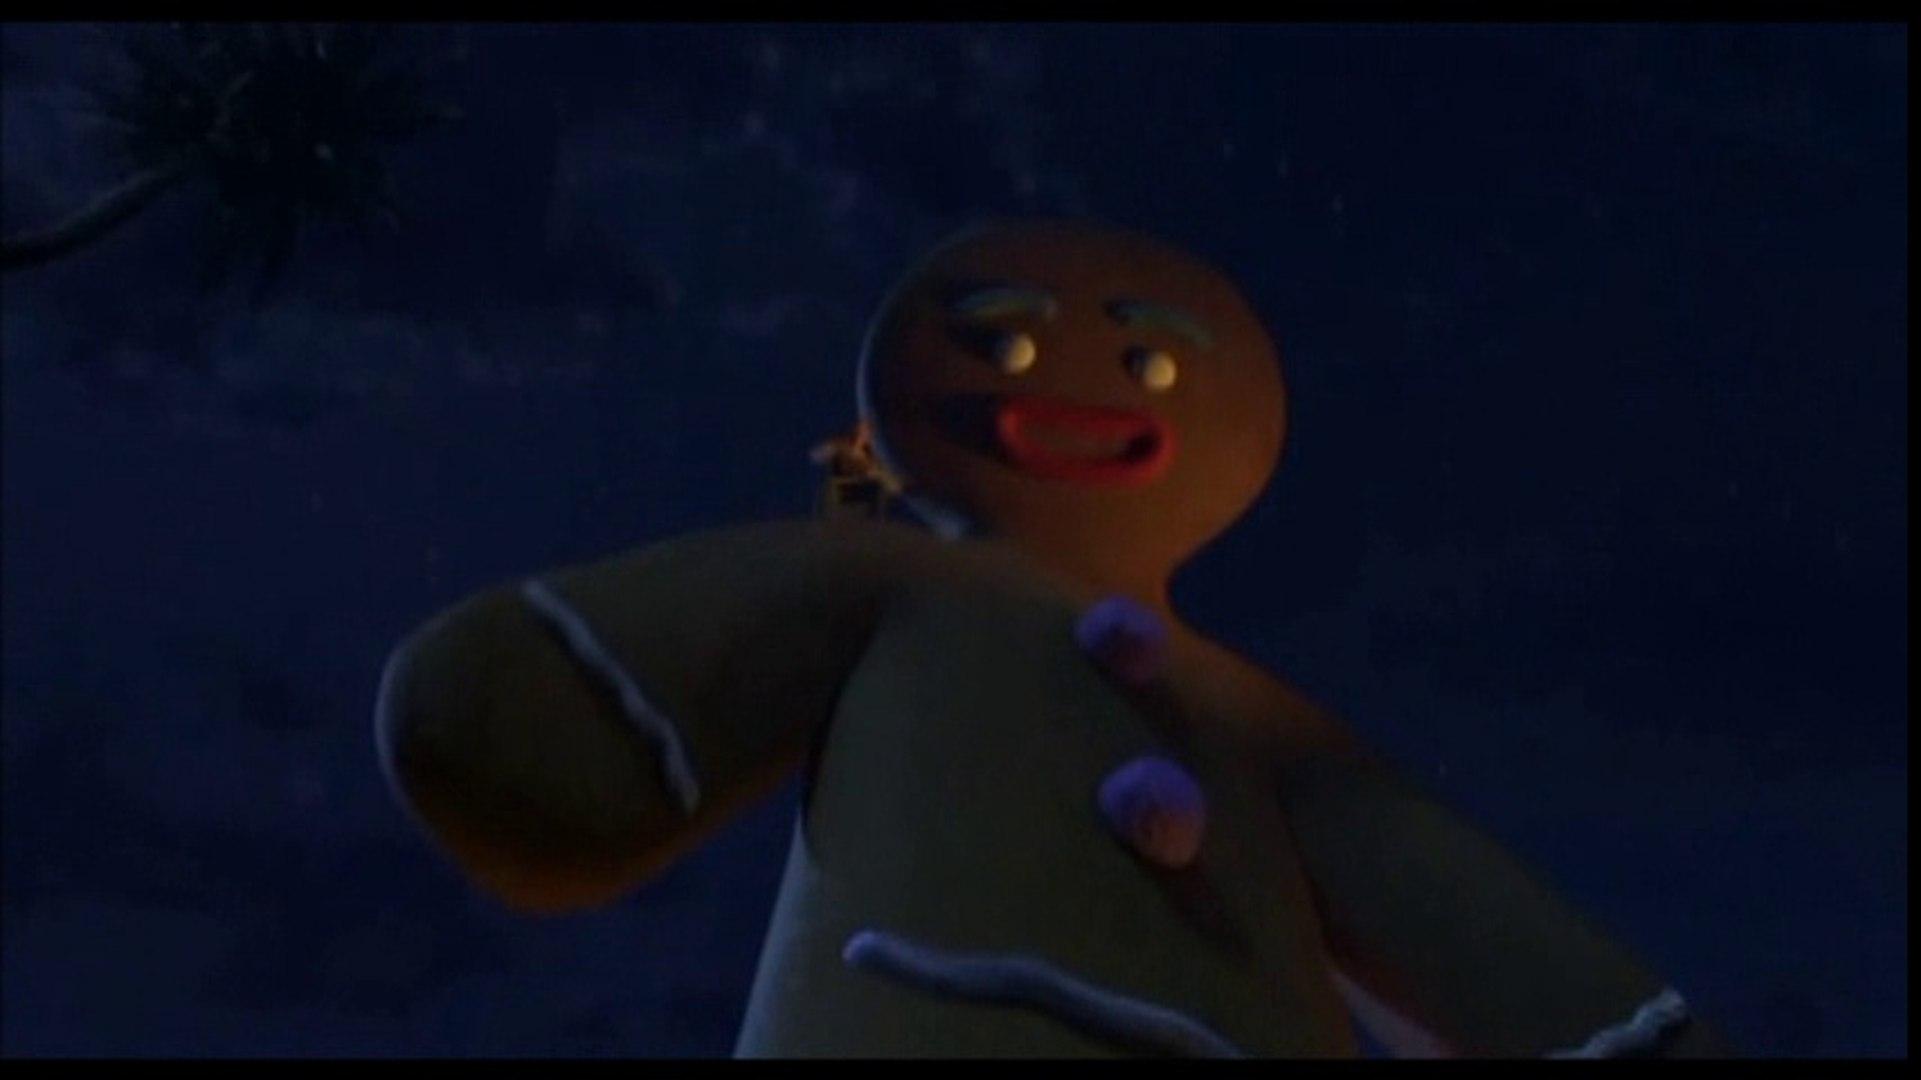 Biscotto gigante shrek